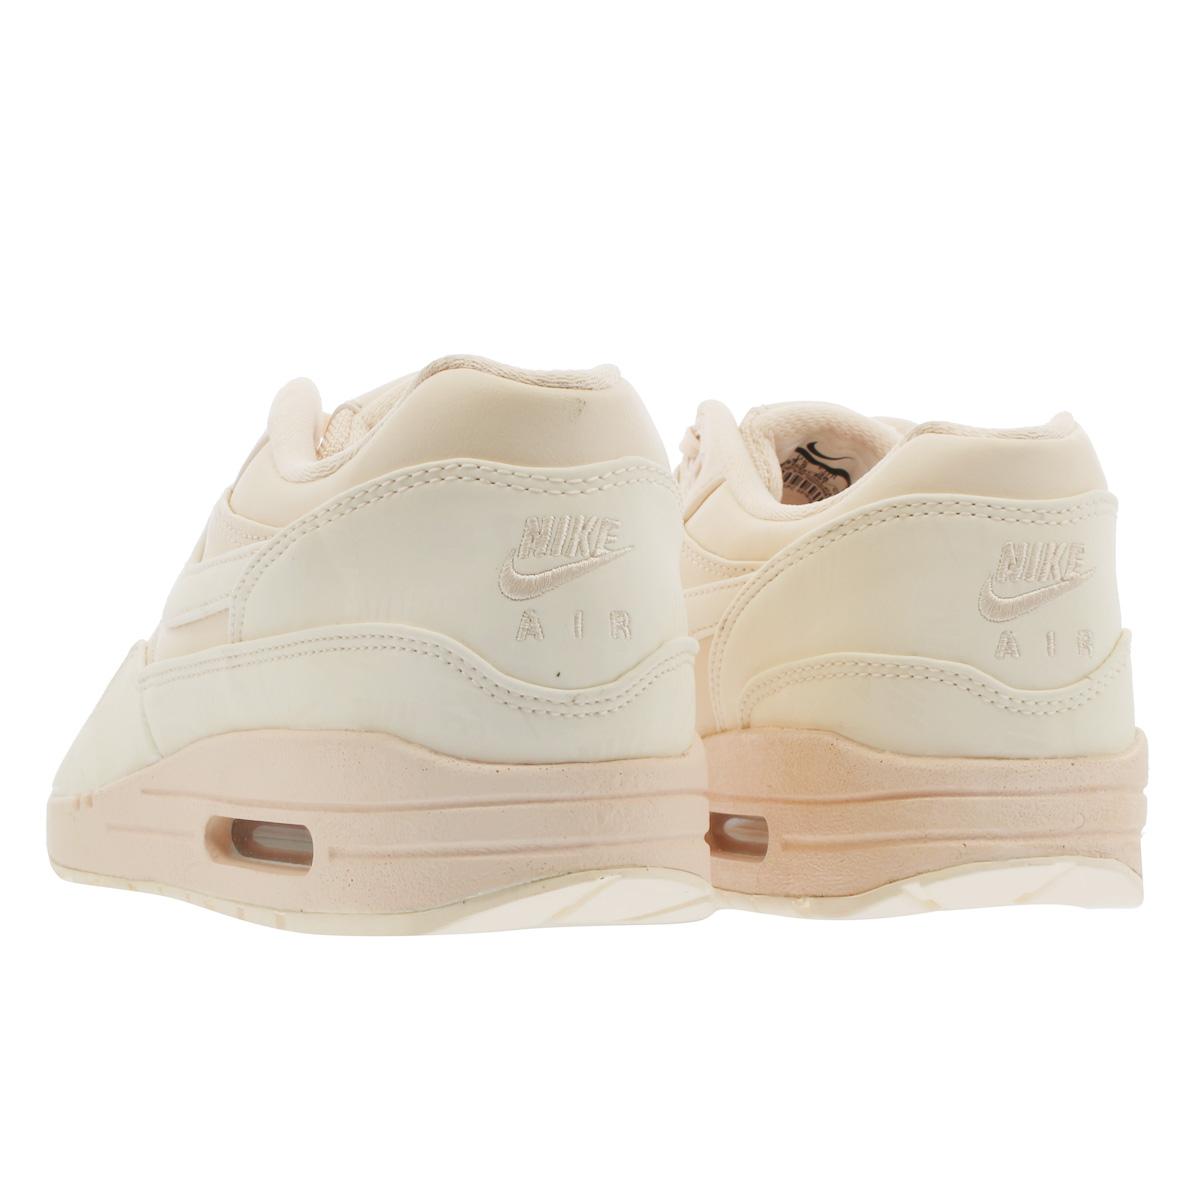 e6e26829f9 ... NIKE WMNS AIR MAX 1 LX Nike women Air Max 1 GUAVA ICE/GUAVA ICE ...